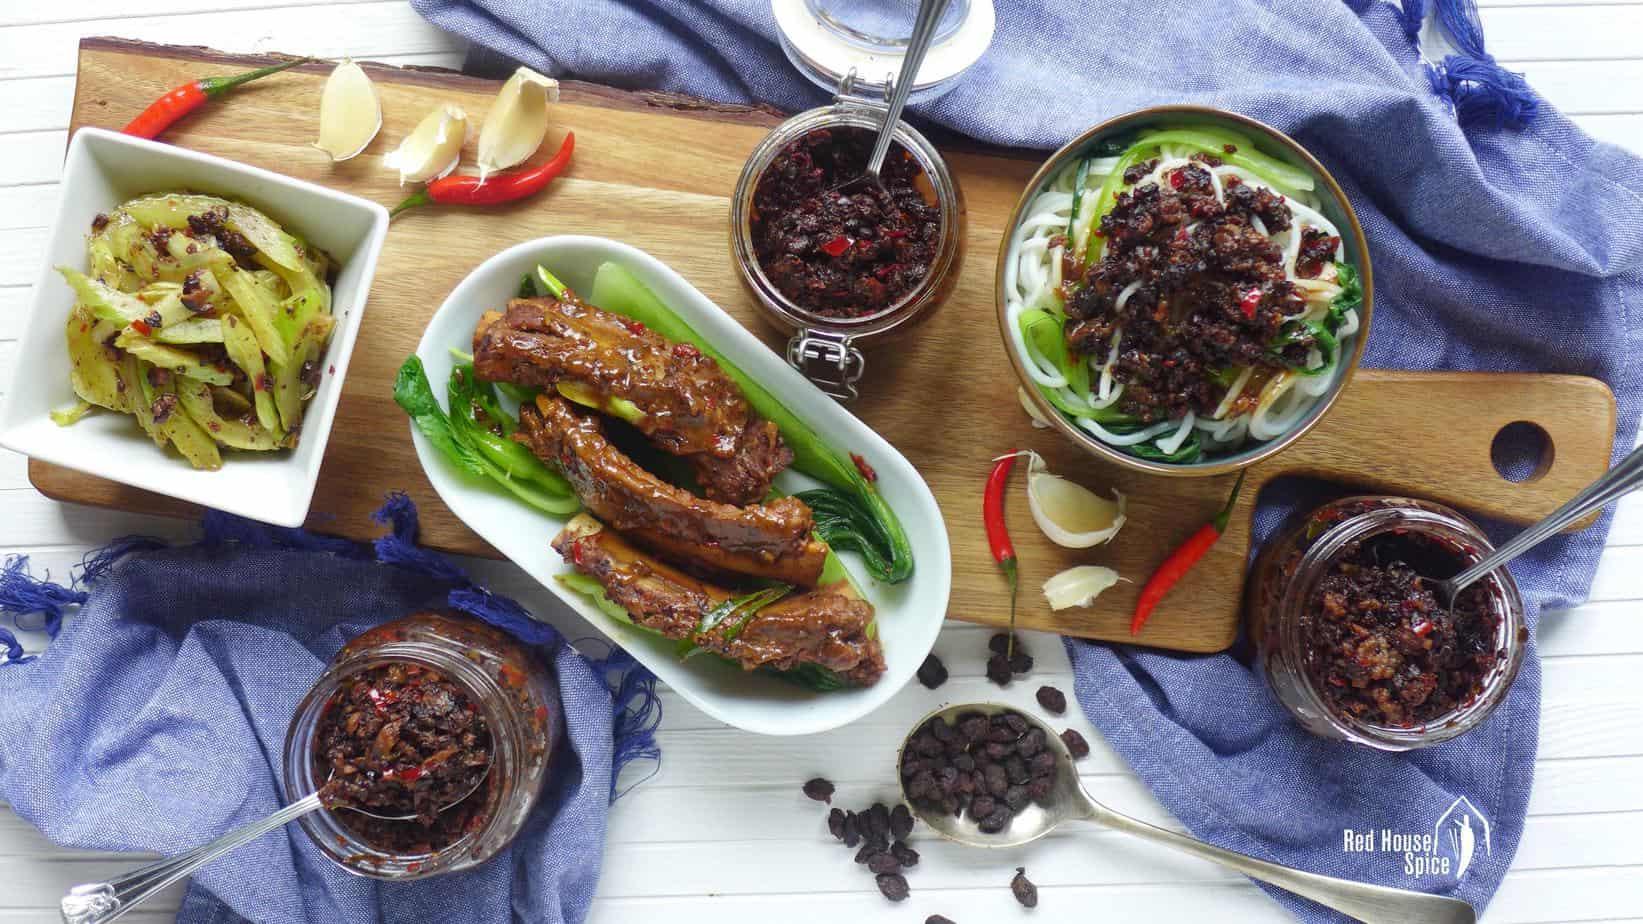 Spicy black bean sauce—three versions (辣豆豉酱)